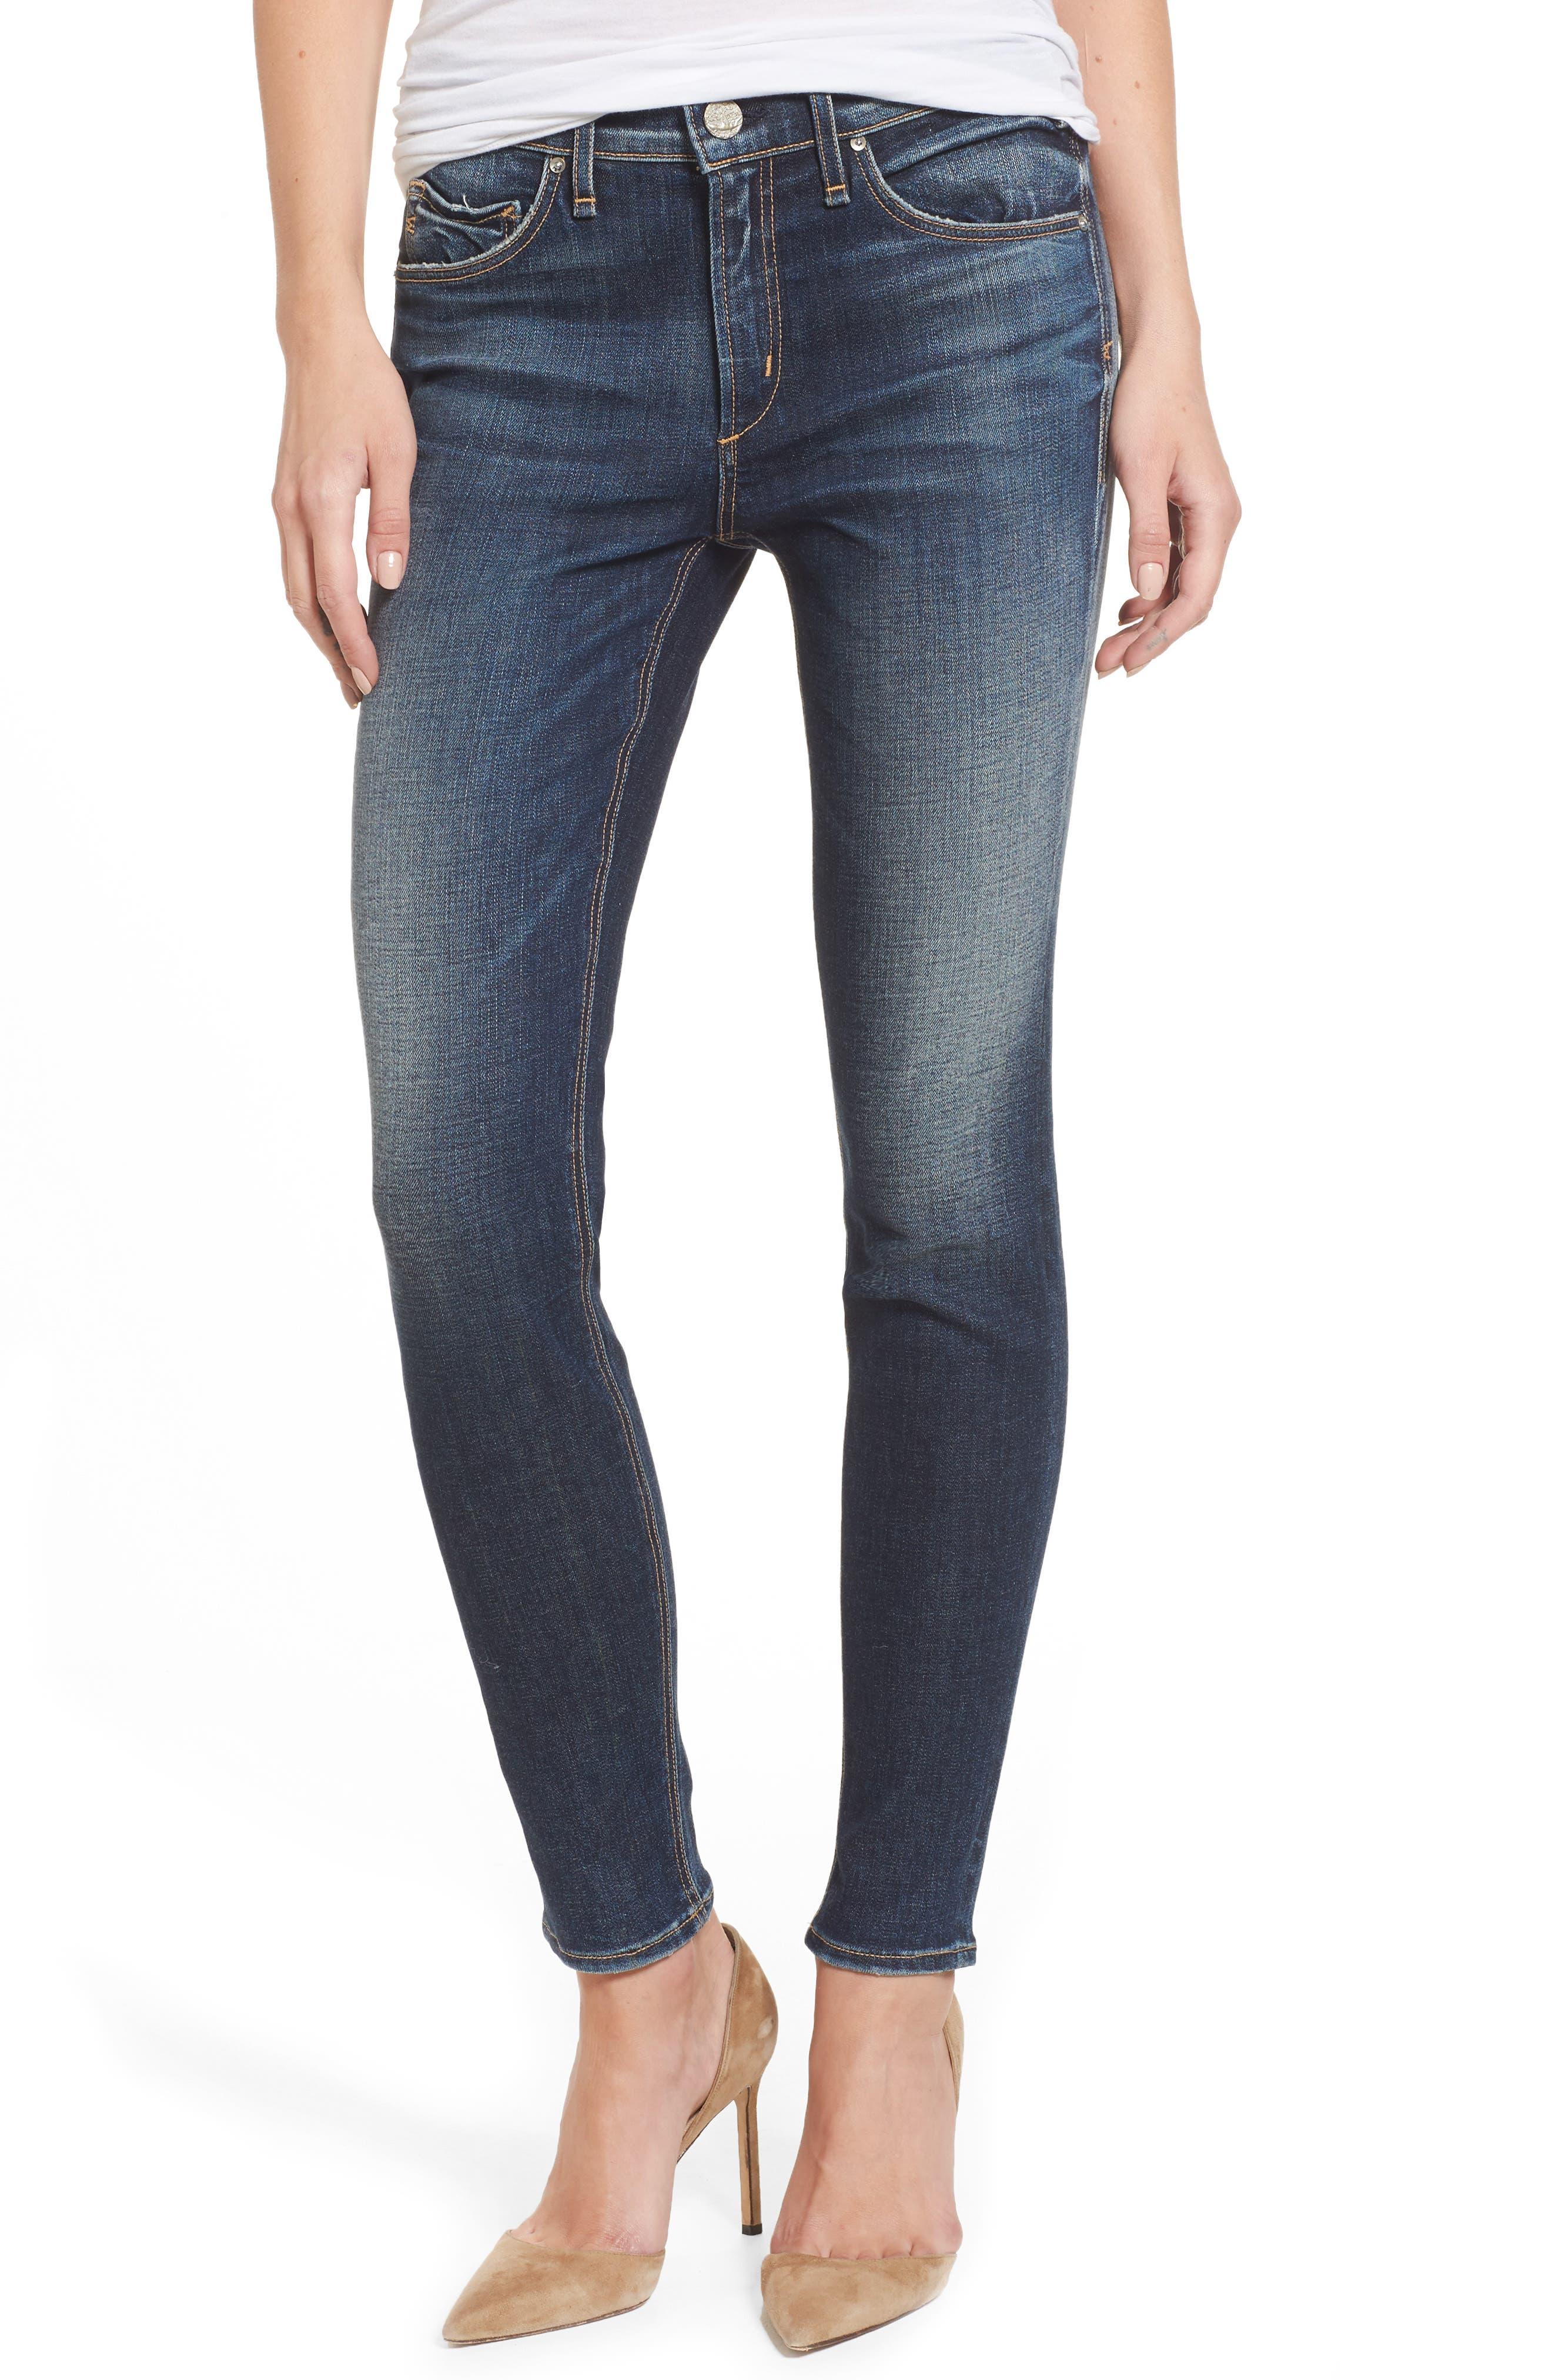 McGuire Newton High Waist Skinny Jeans (One Thousand Suns)